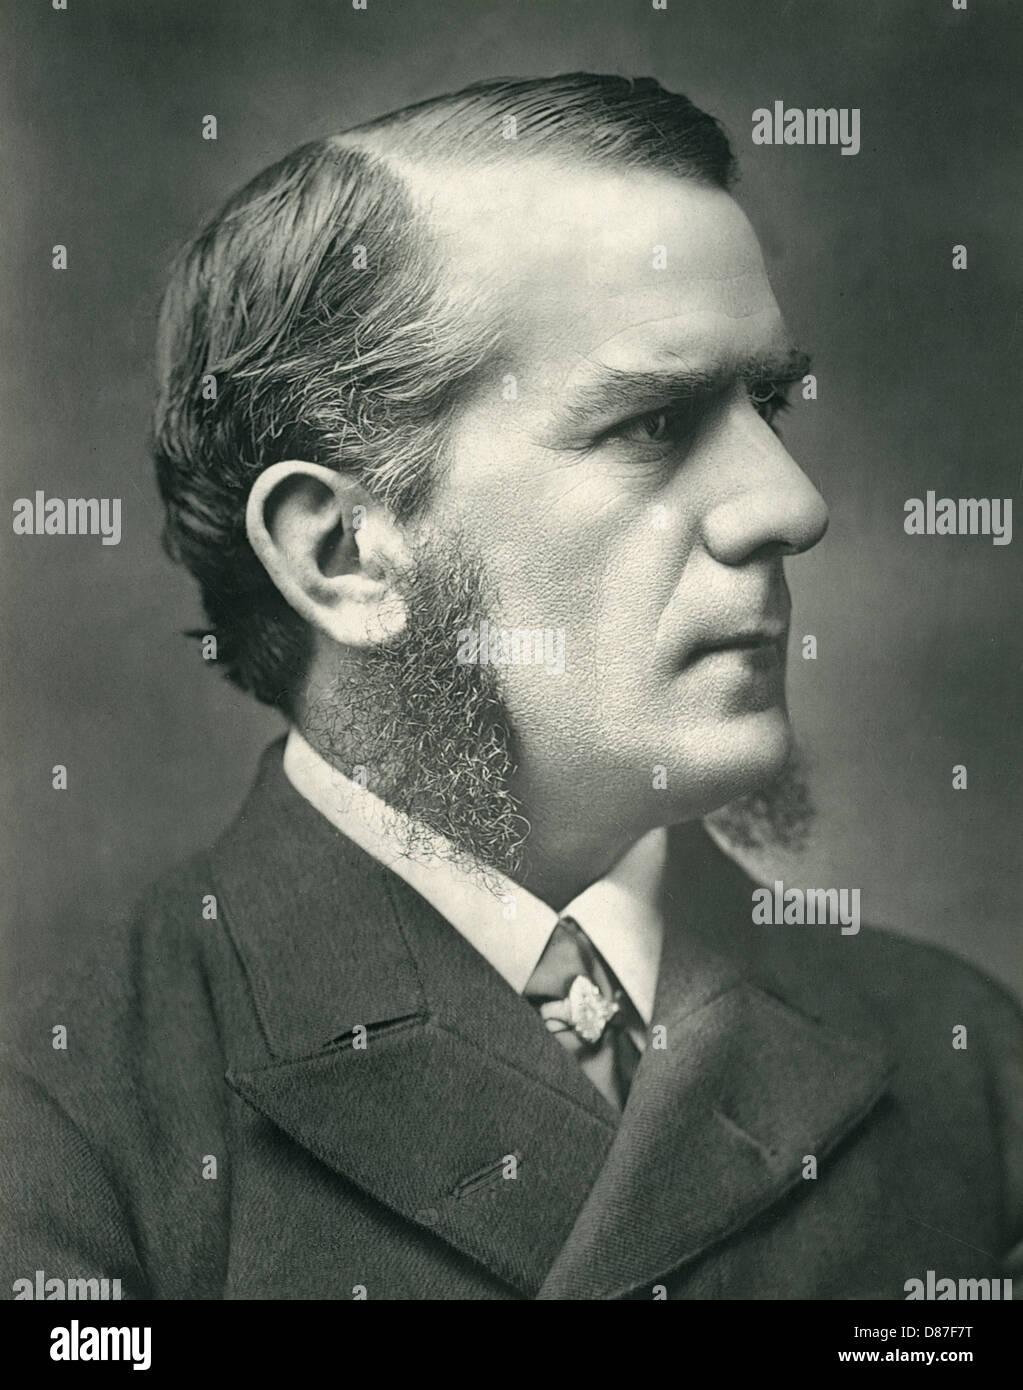 Sir Eg Clarke Bassano - Stock Image